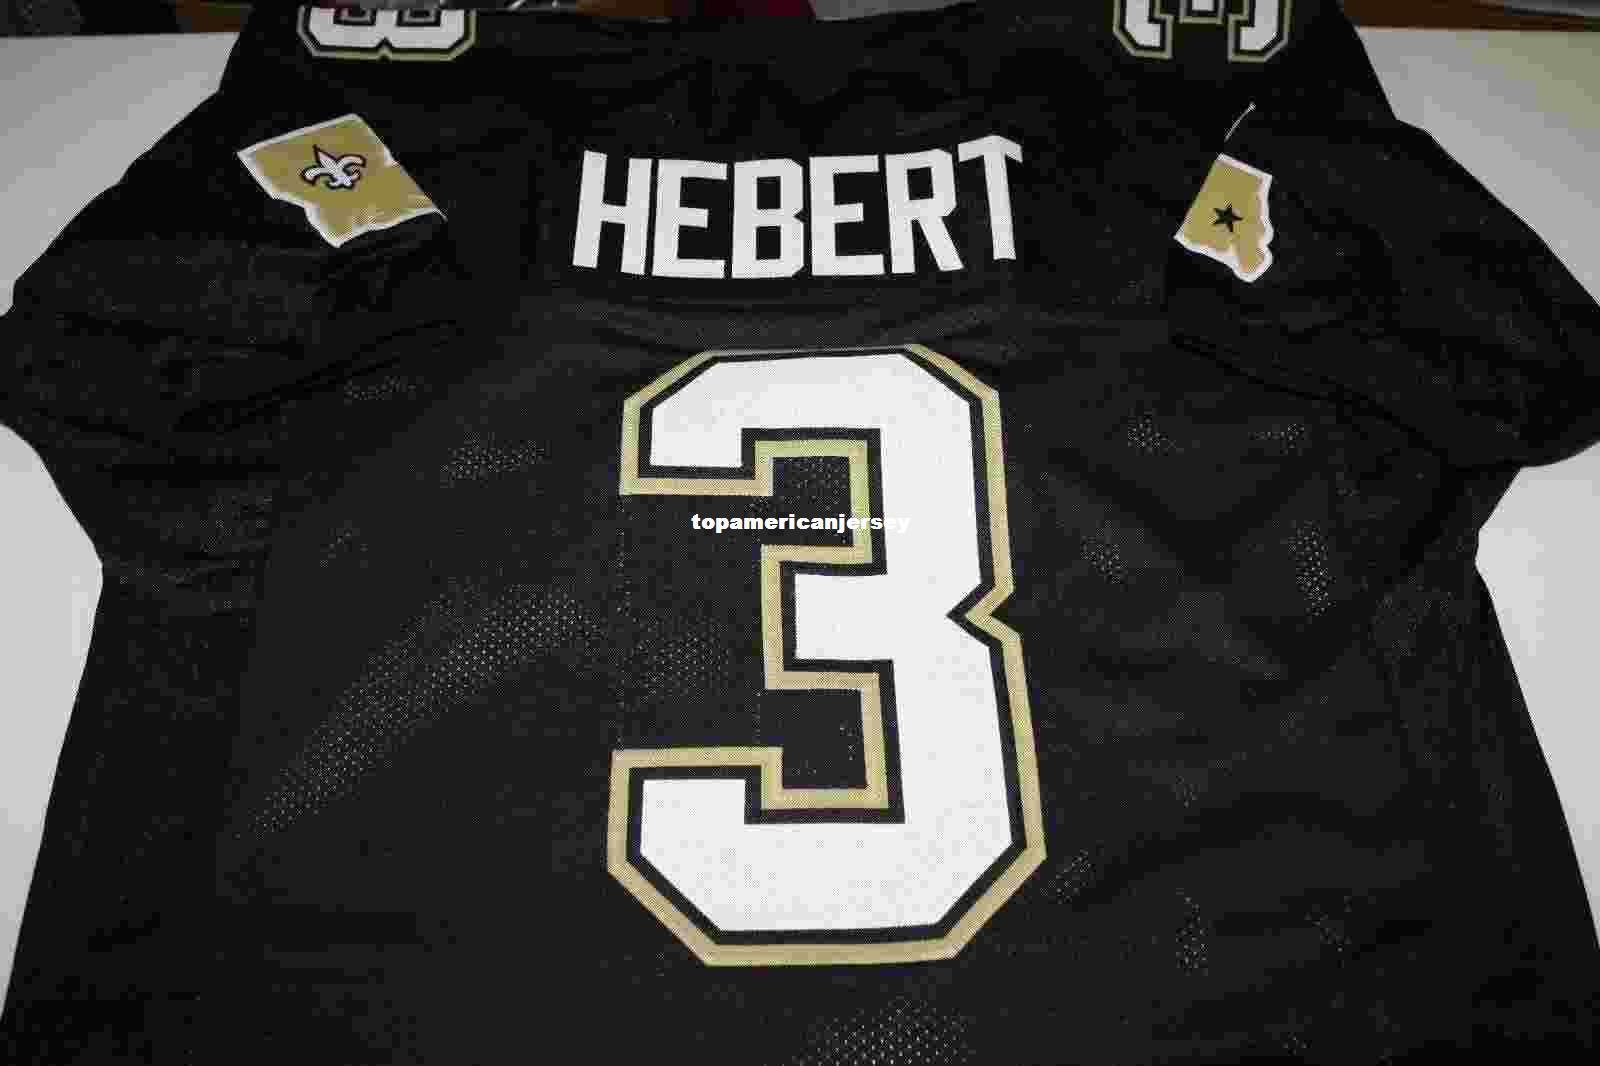 2021 Cheap Retro BOBBY HEBERT #3 CUSTOM MITCHELL & NESS Jersey BLACK Stitching Mens Football Jerseys Running From Topamericanjersey, $18.26   ...